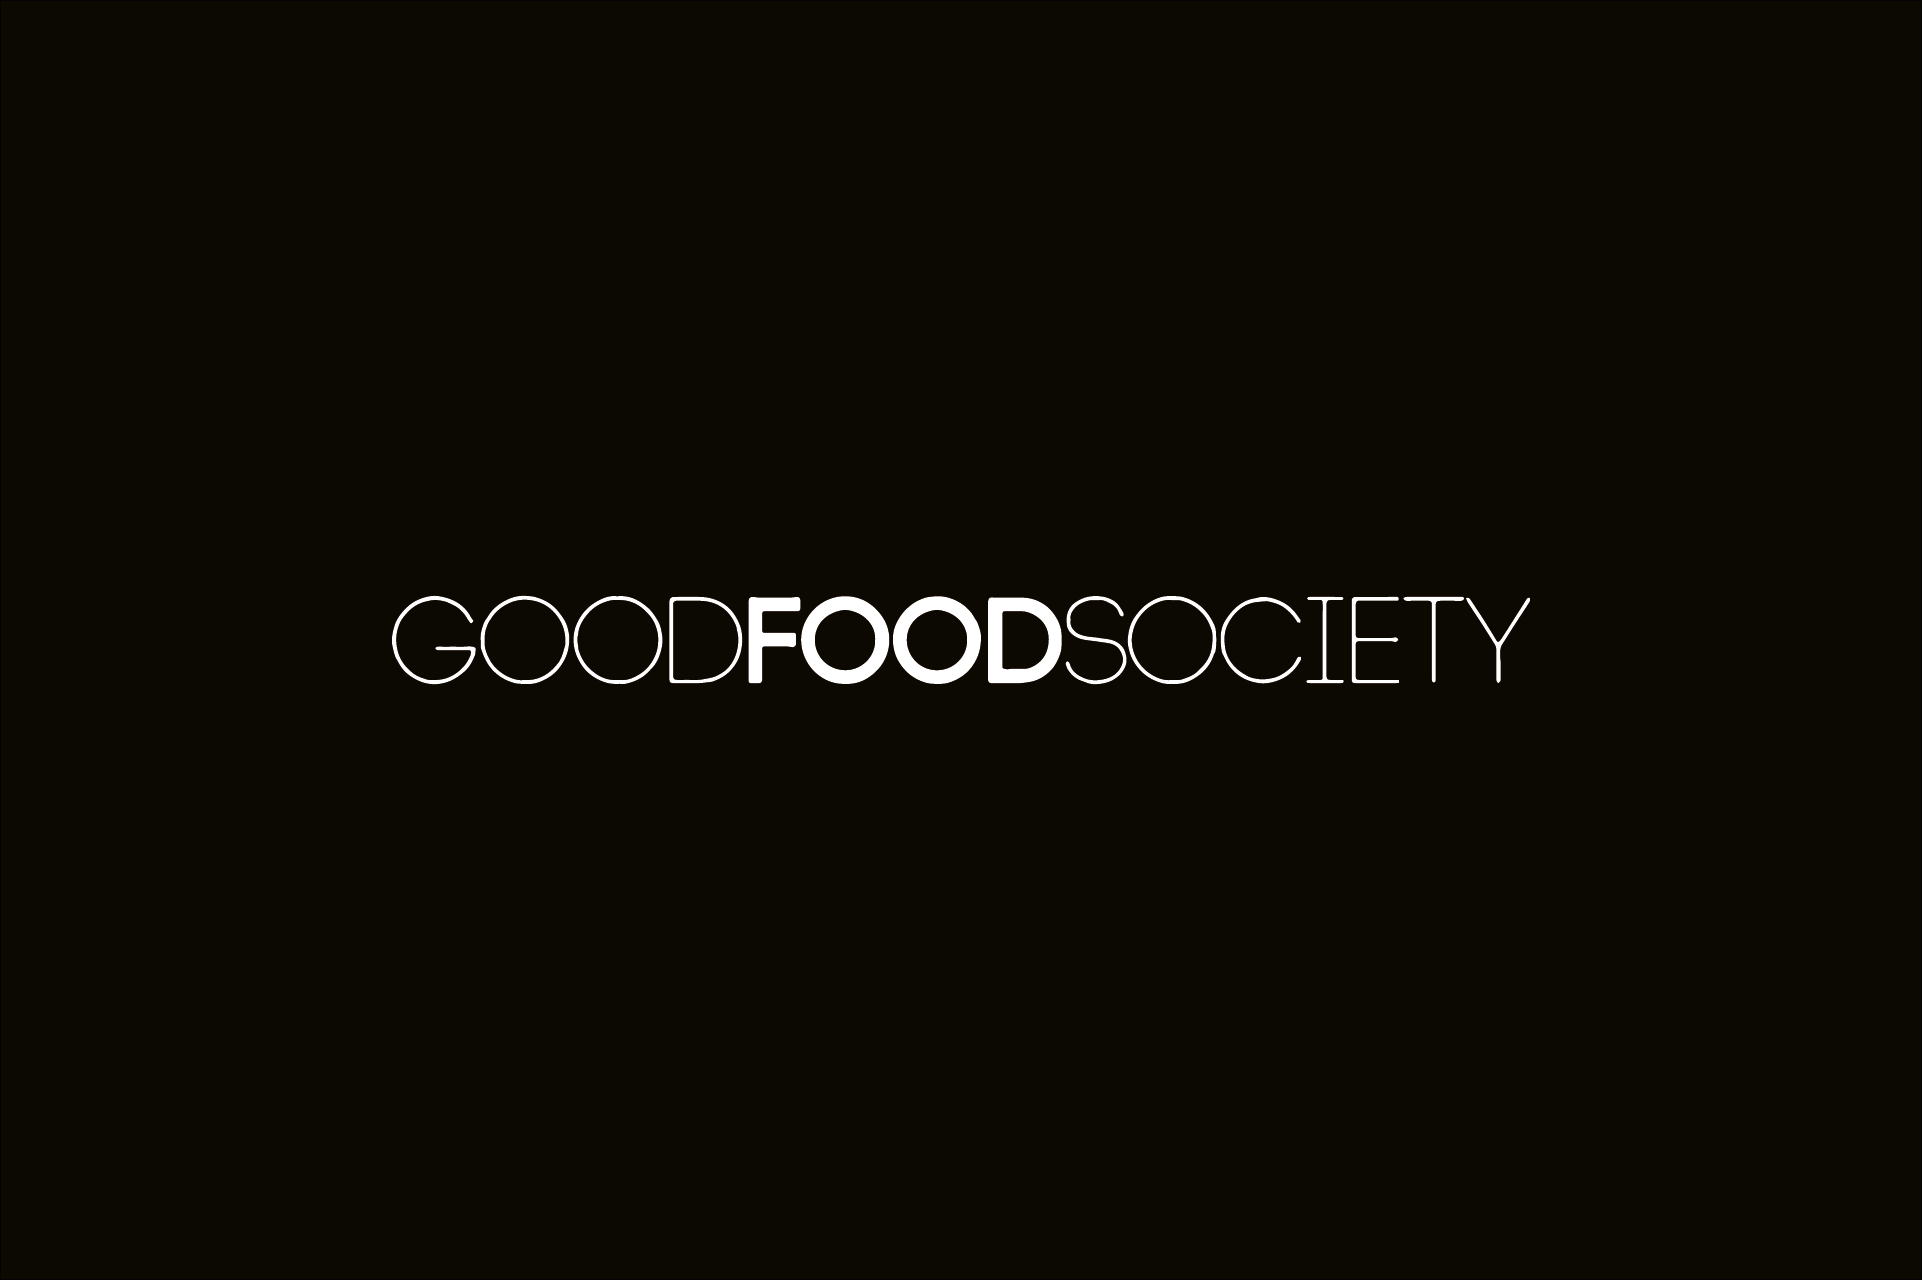 Good Food Society